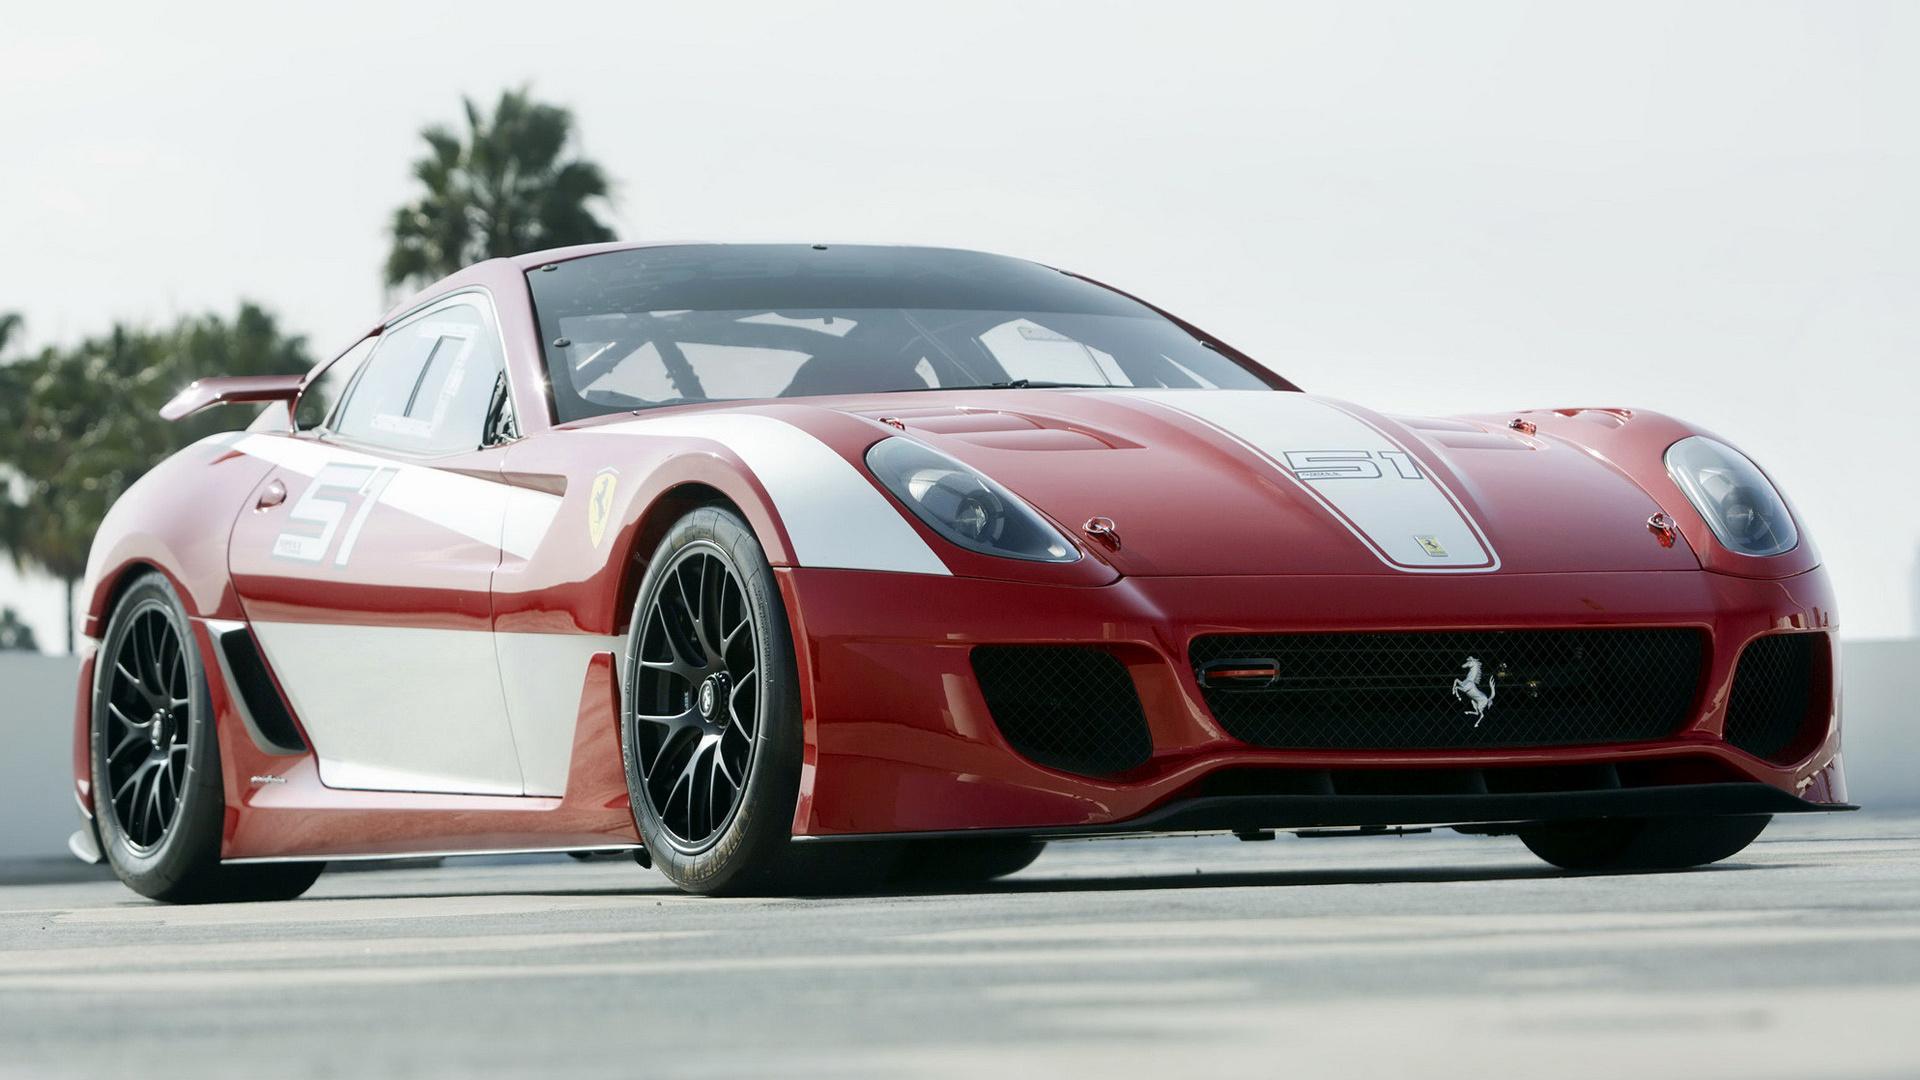 2009 Ferrari 599XX - Wallpapers and HD Images | Car Pixel